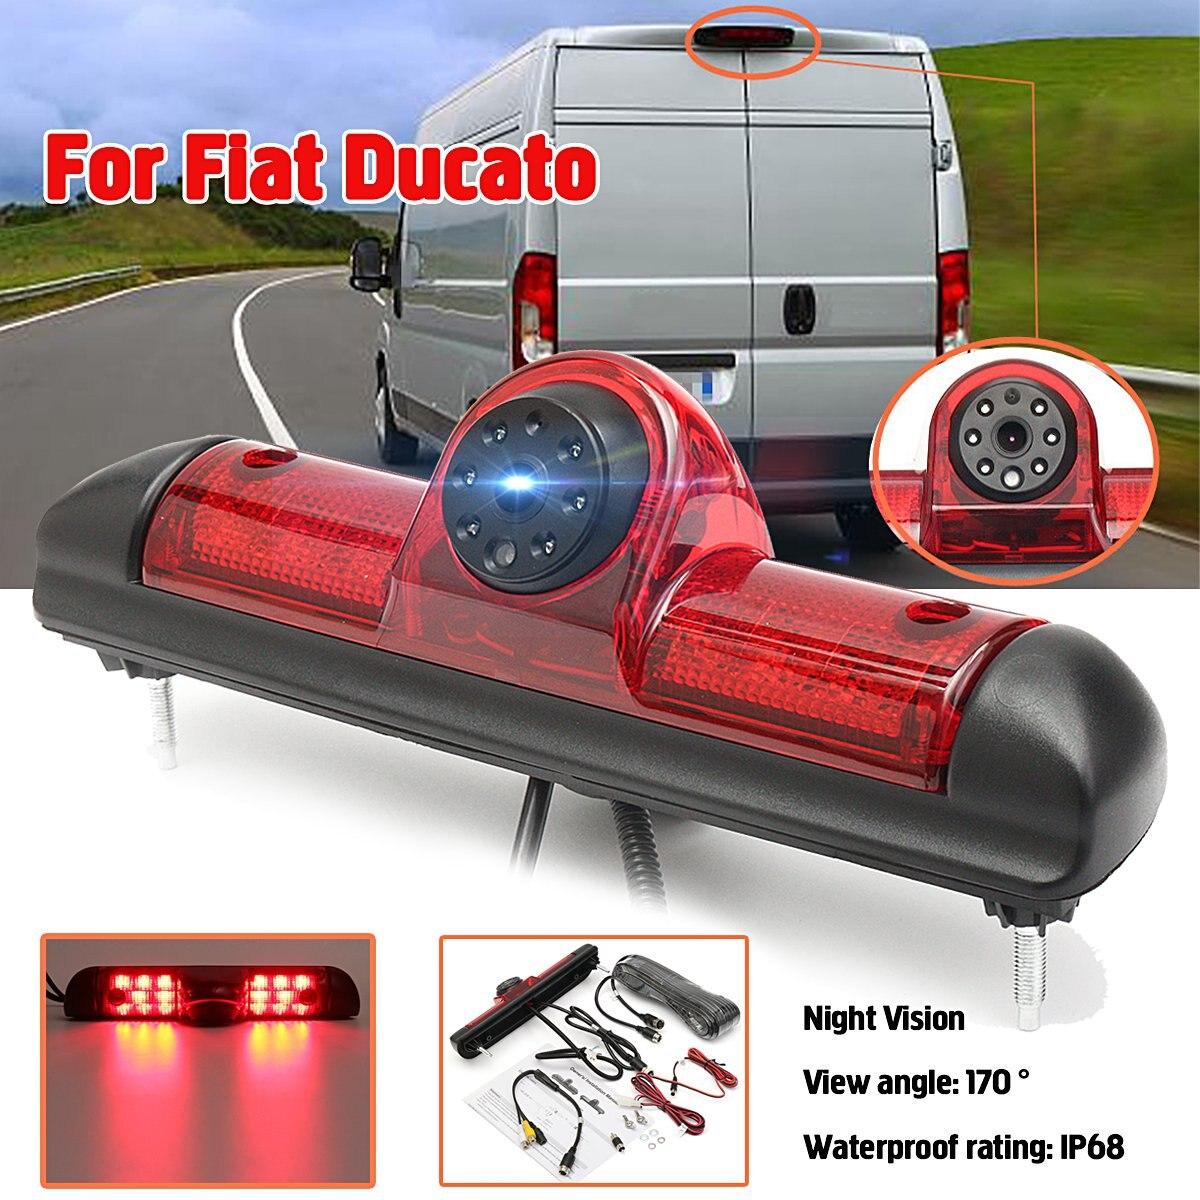 170 Degree Rear View Reversing Backup Camera Brake Light Night Vision for Fiat Ducato Car Waterproof